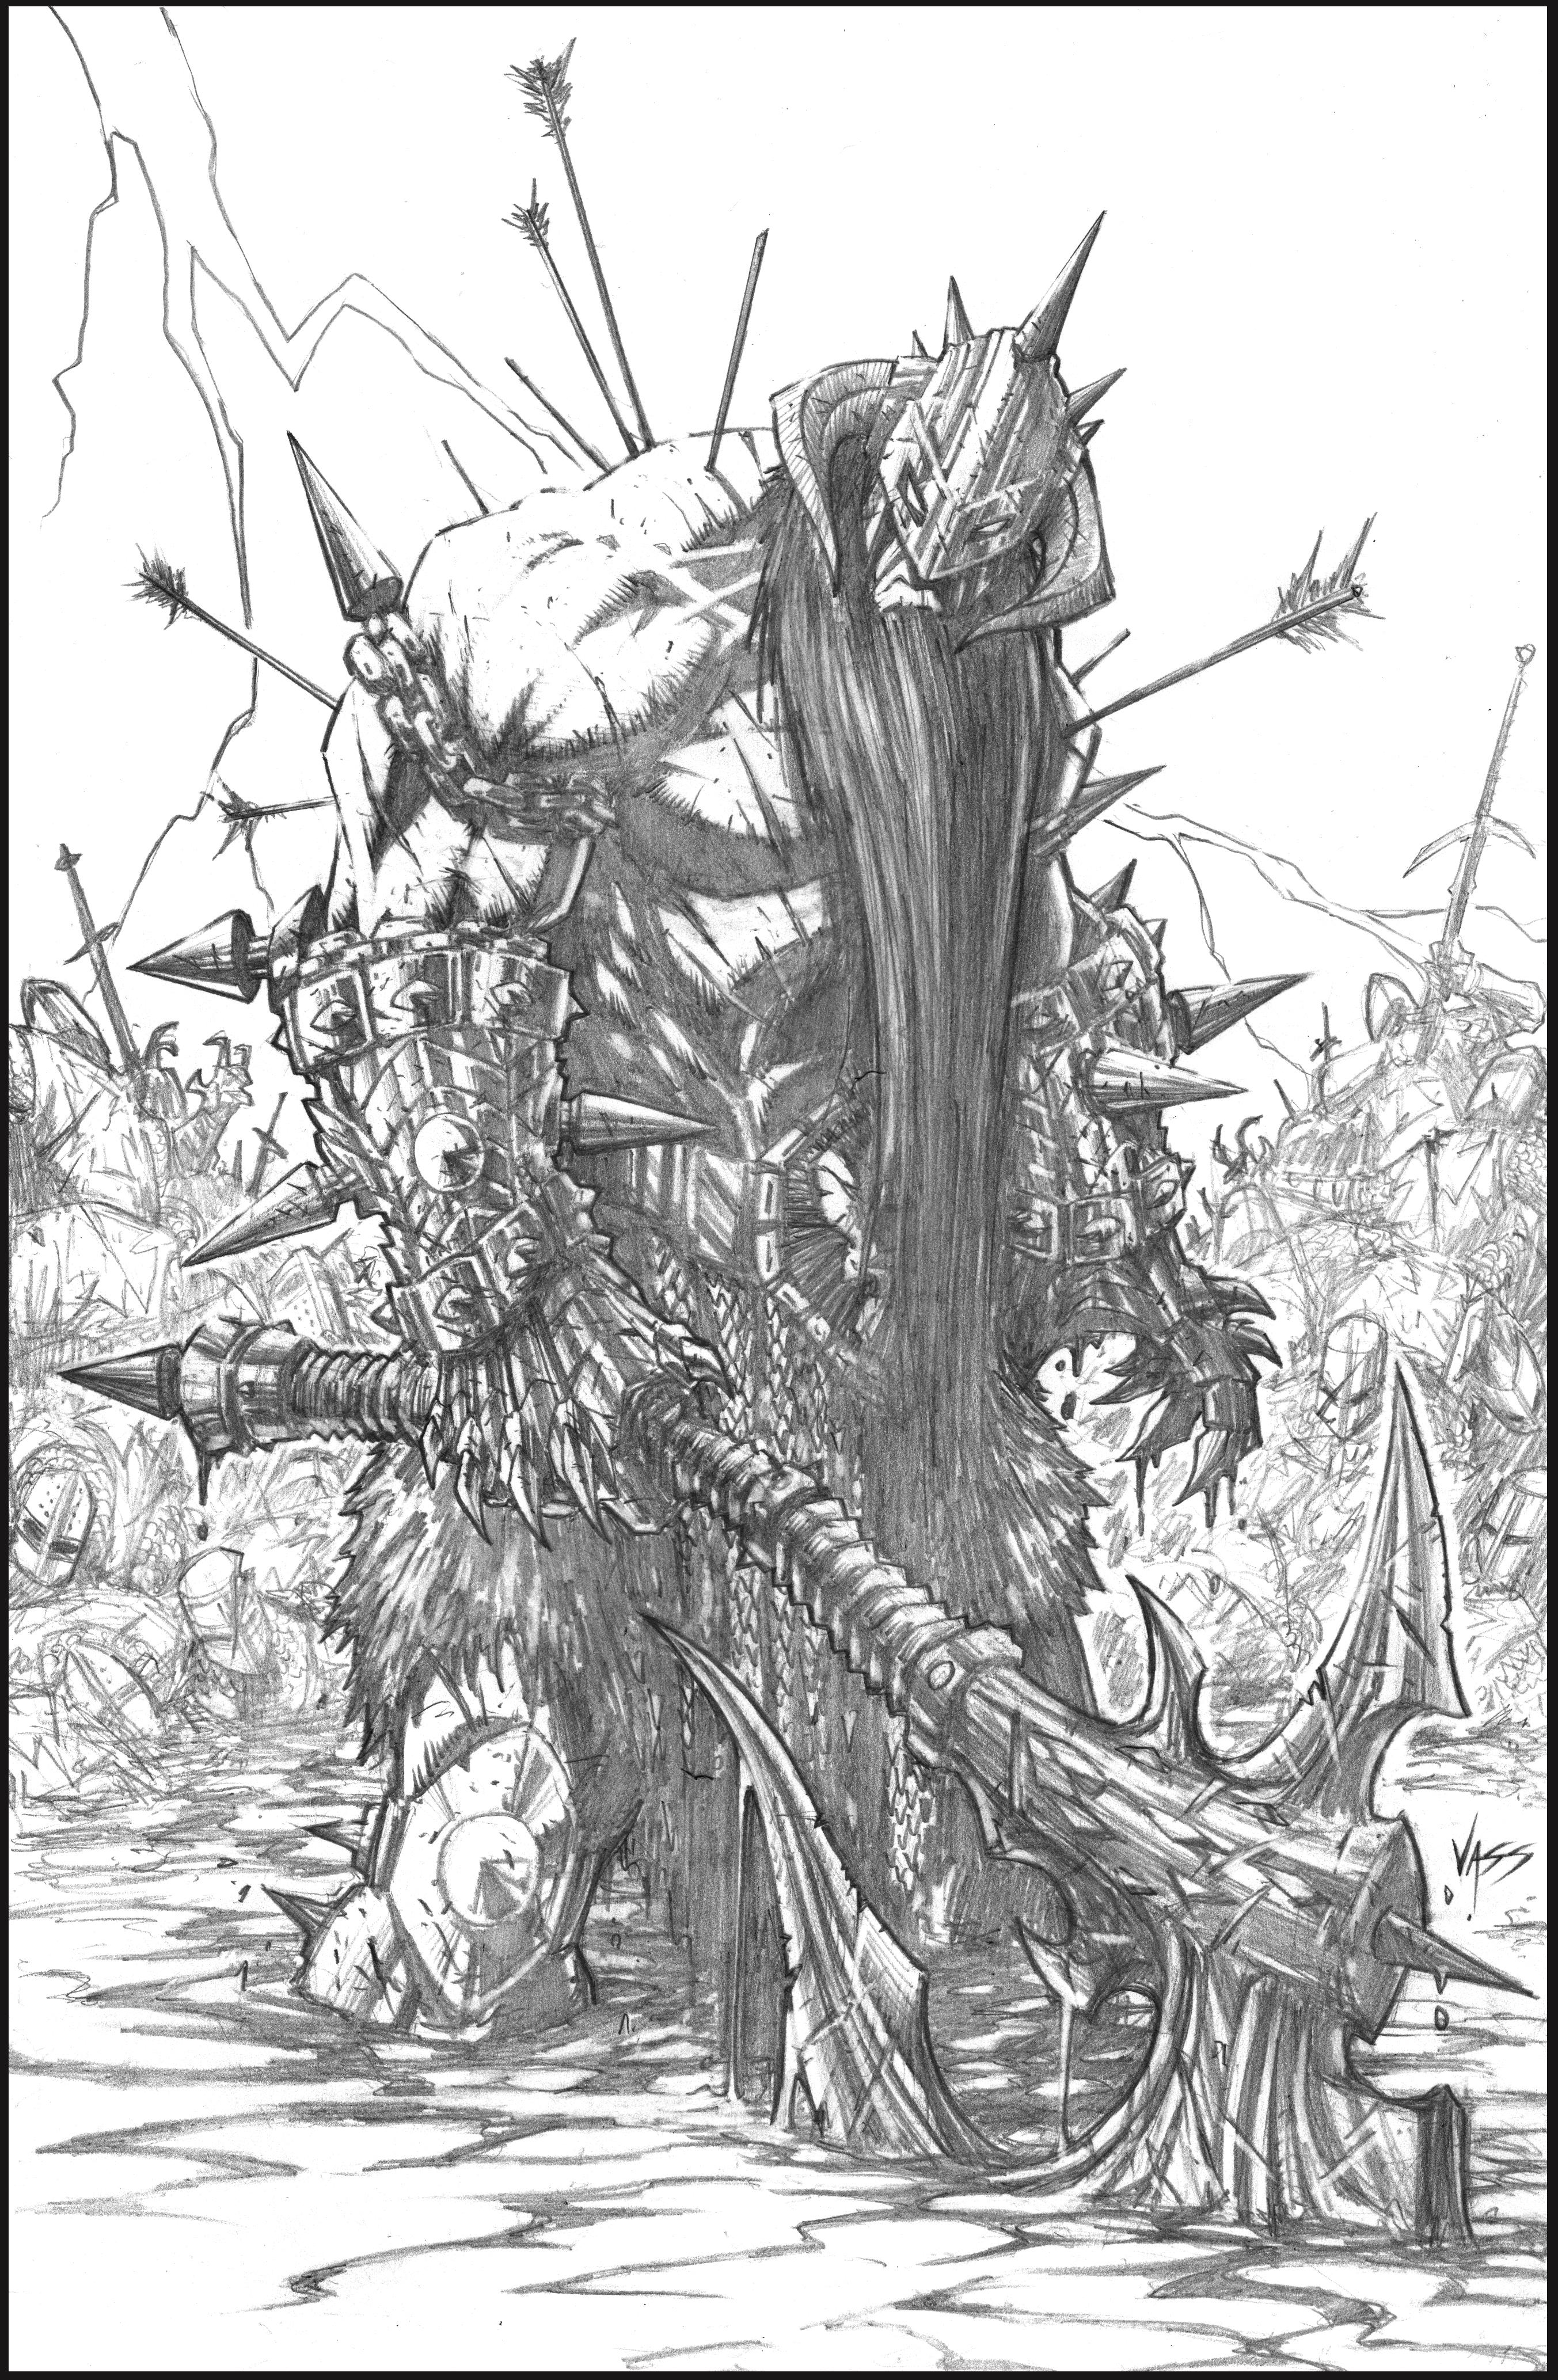 Comic Book Cover Drawing : Murderthane pencils by vass comics on deviantart